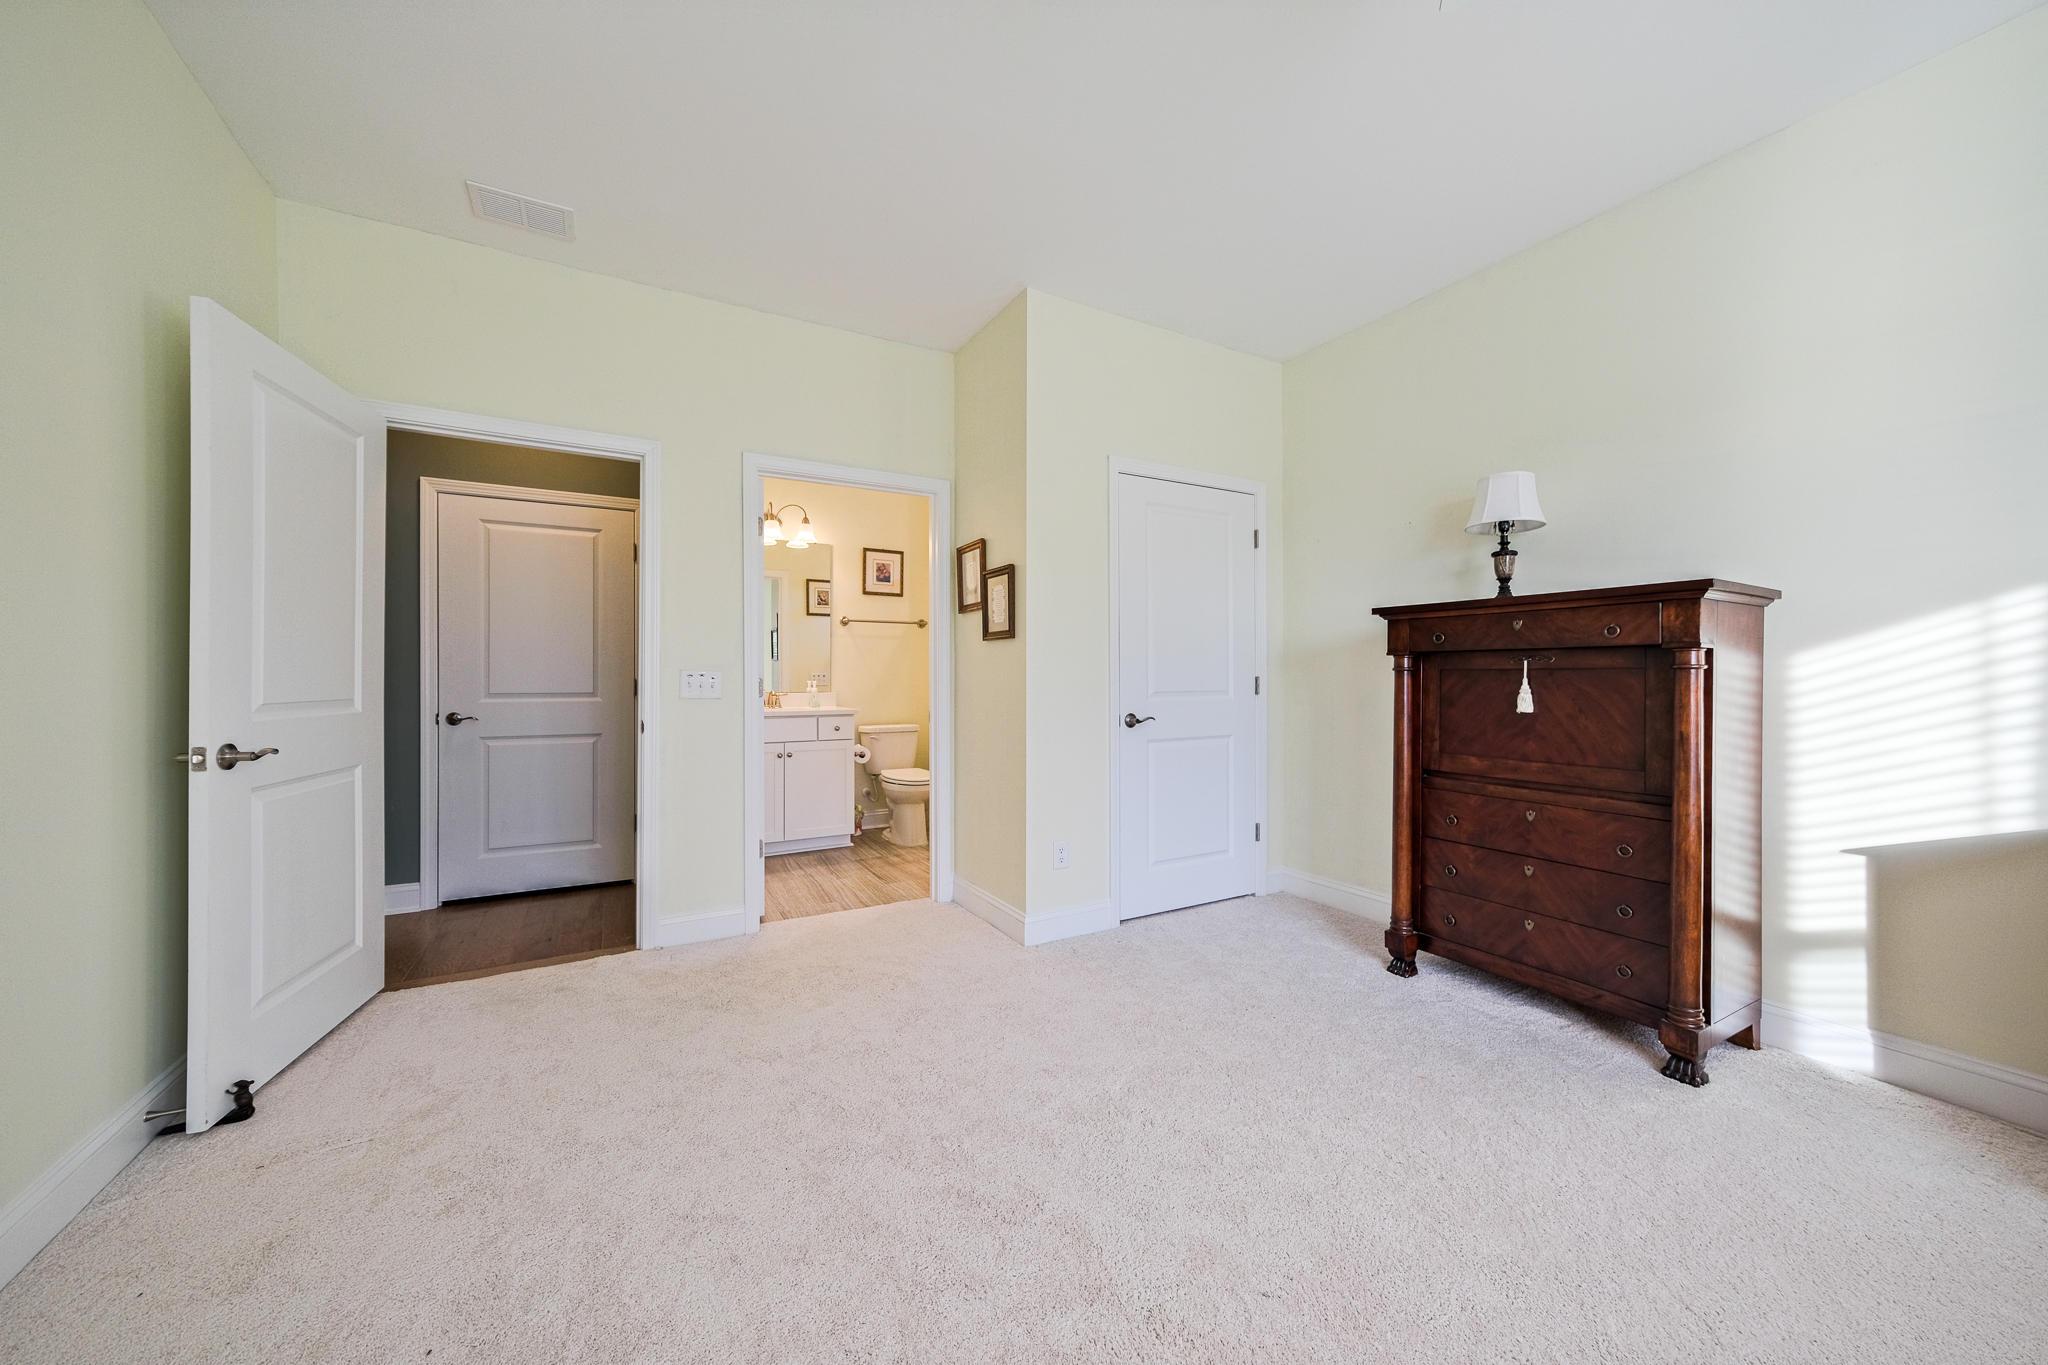 Nexton Homes For Sale - 274 Maple Valley, Summerville, SC - 0